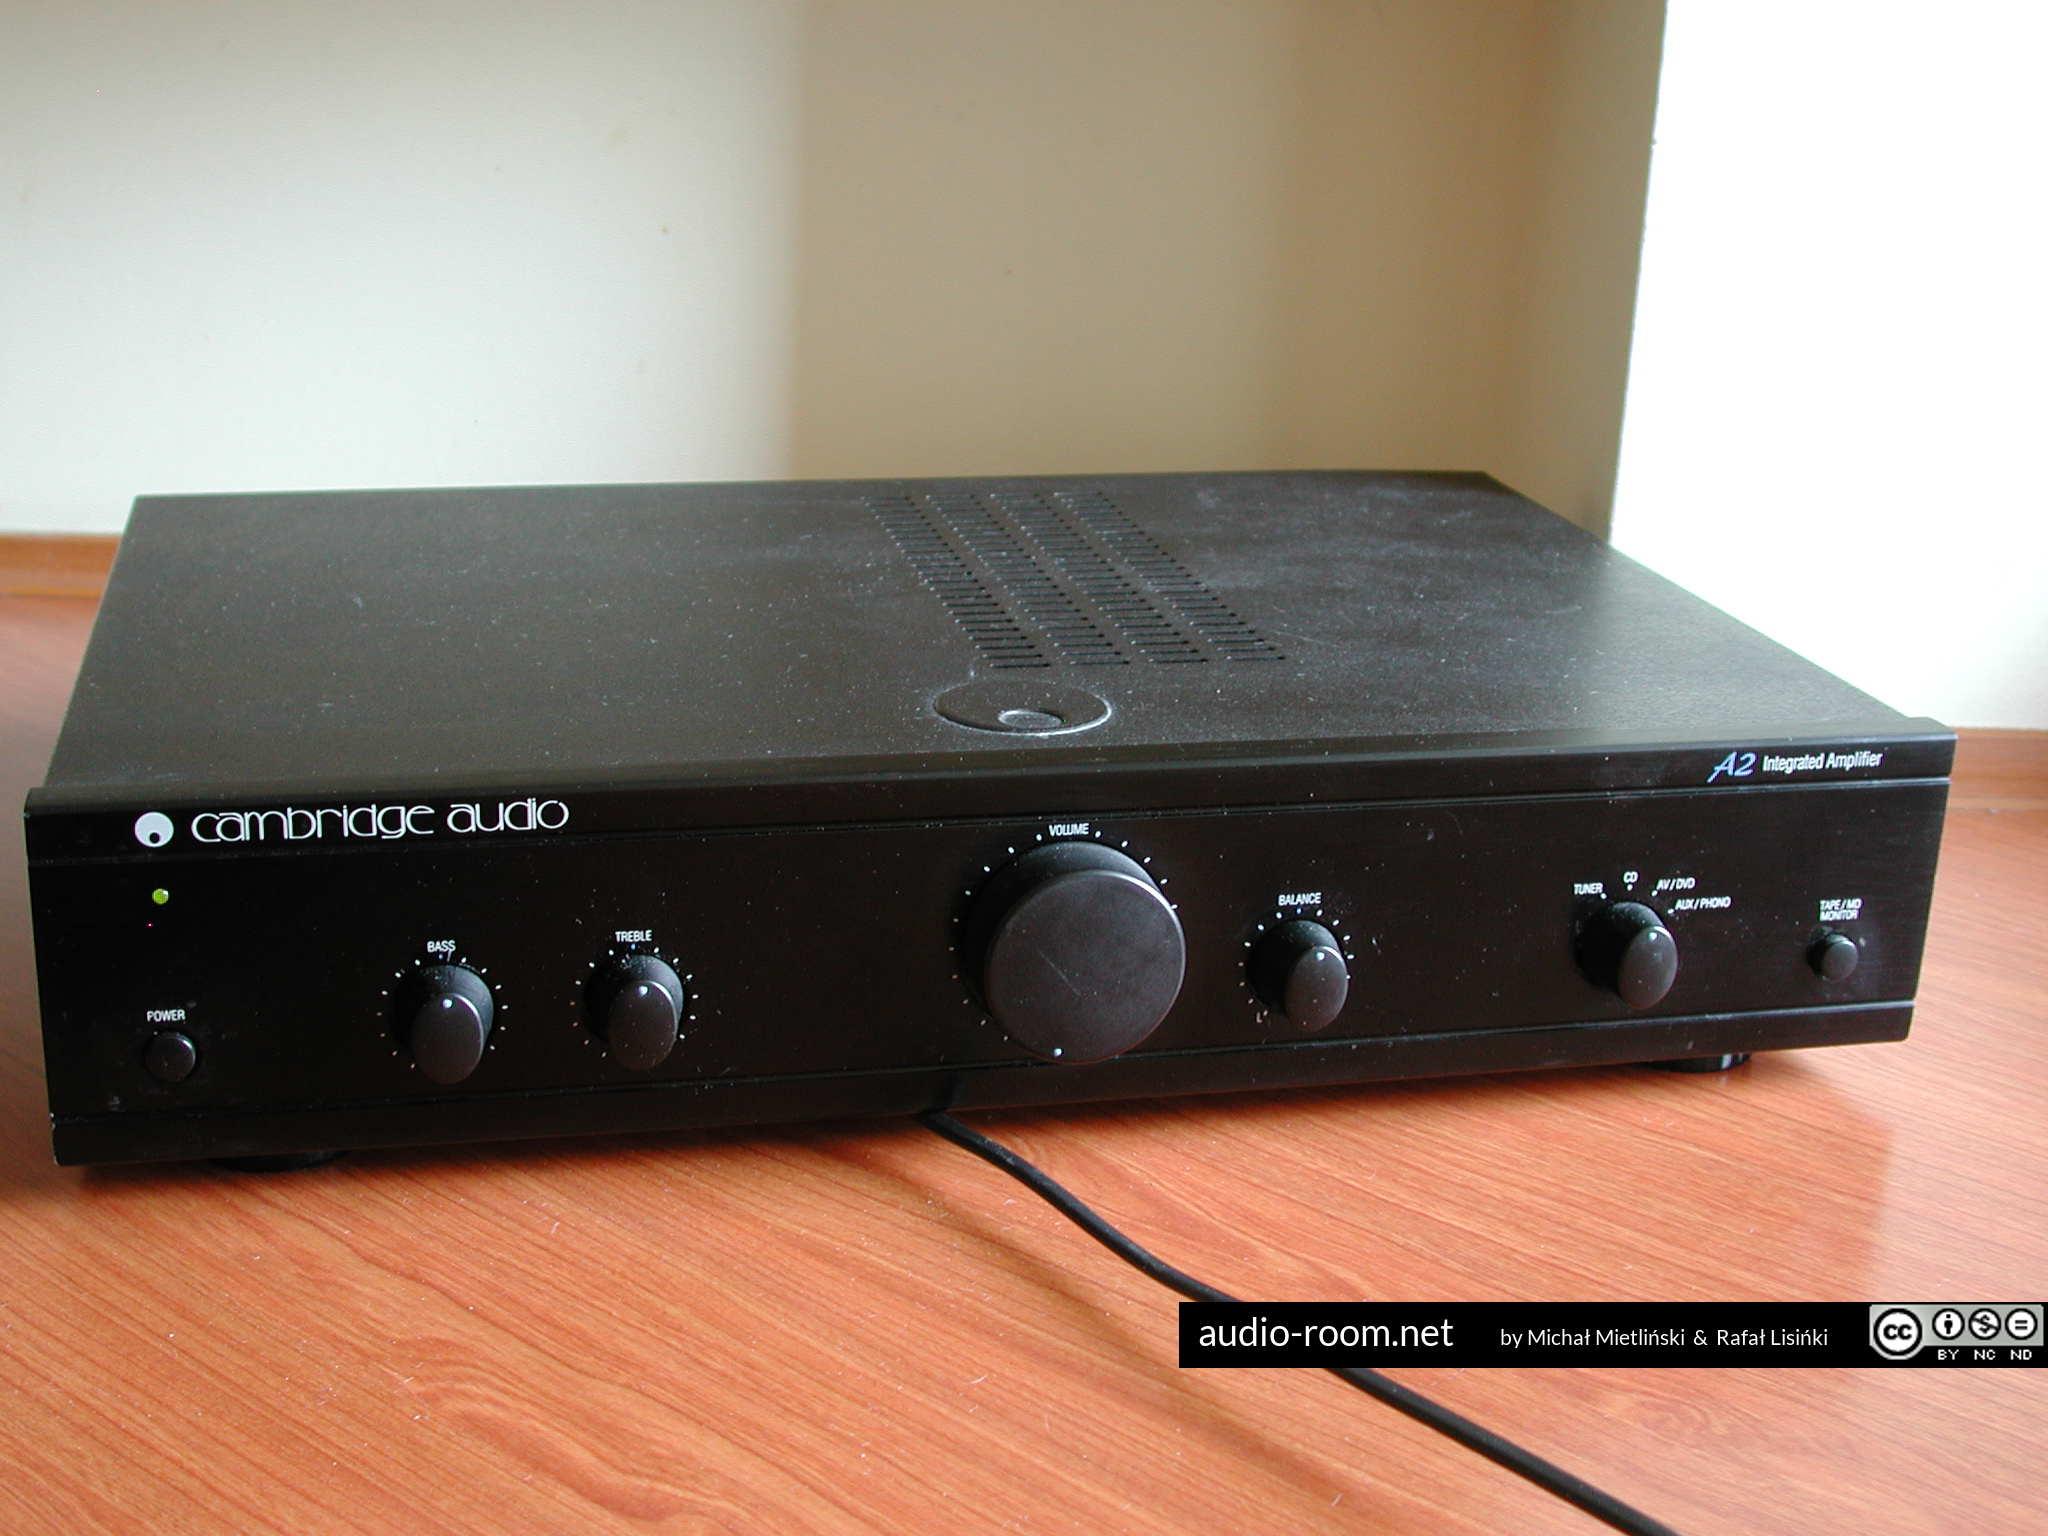 cambridge-audio-a2-dscn0892